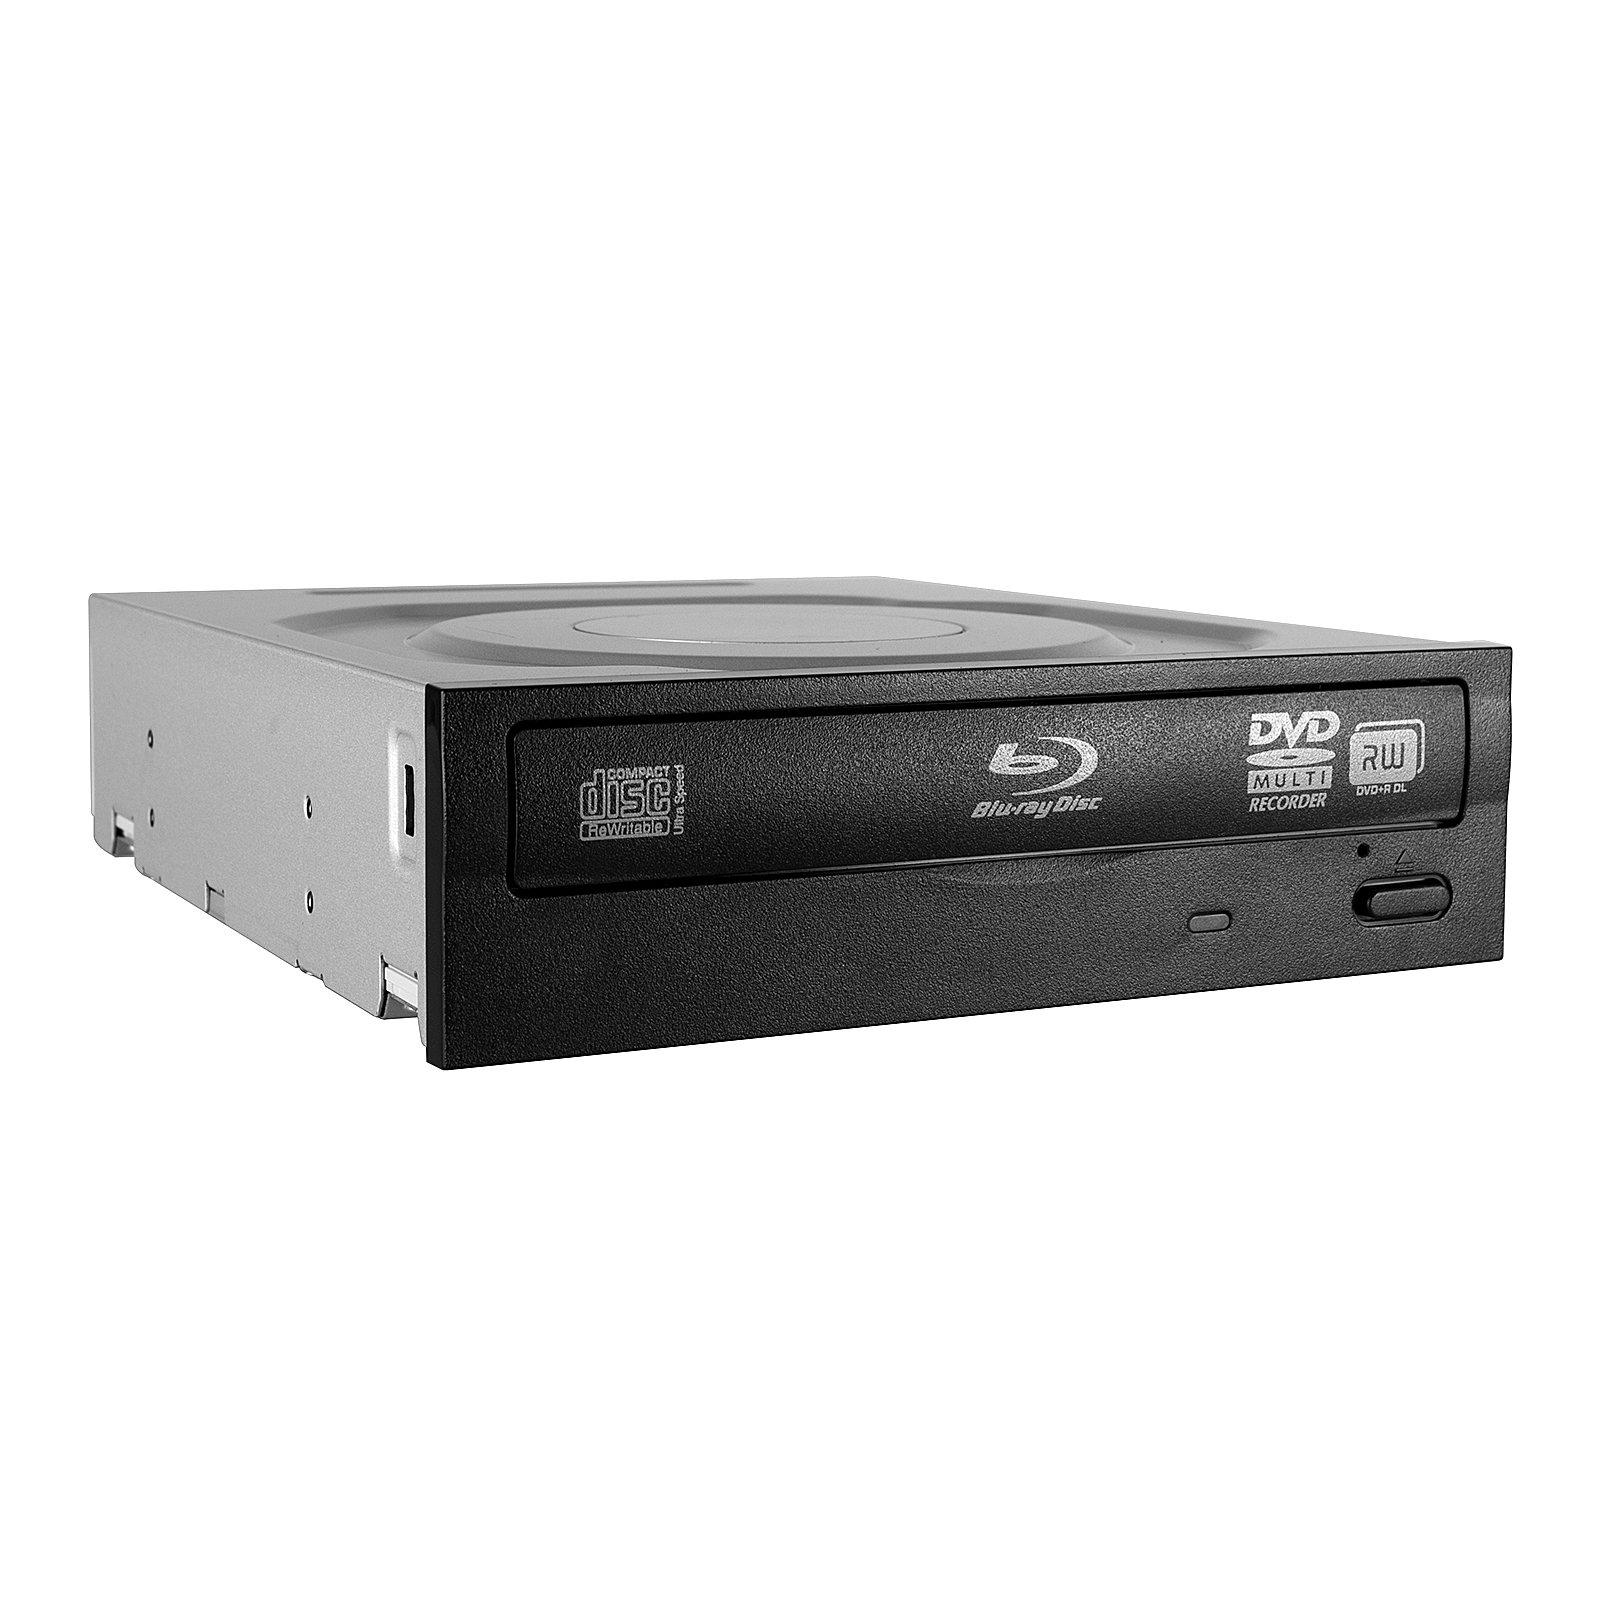 Orange Juice Desktop Computer Internal SATA Blu Ray Player Reader BD 6X Combo DVD CD Burner Drive